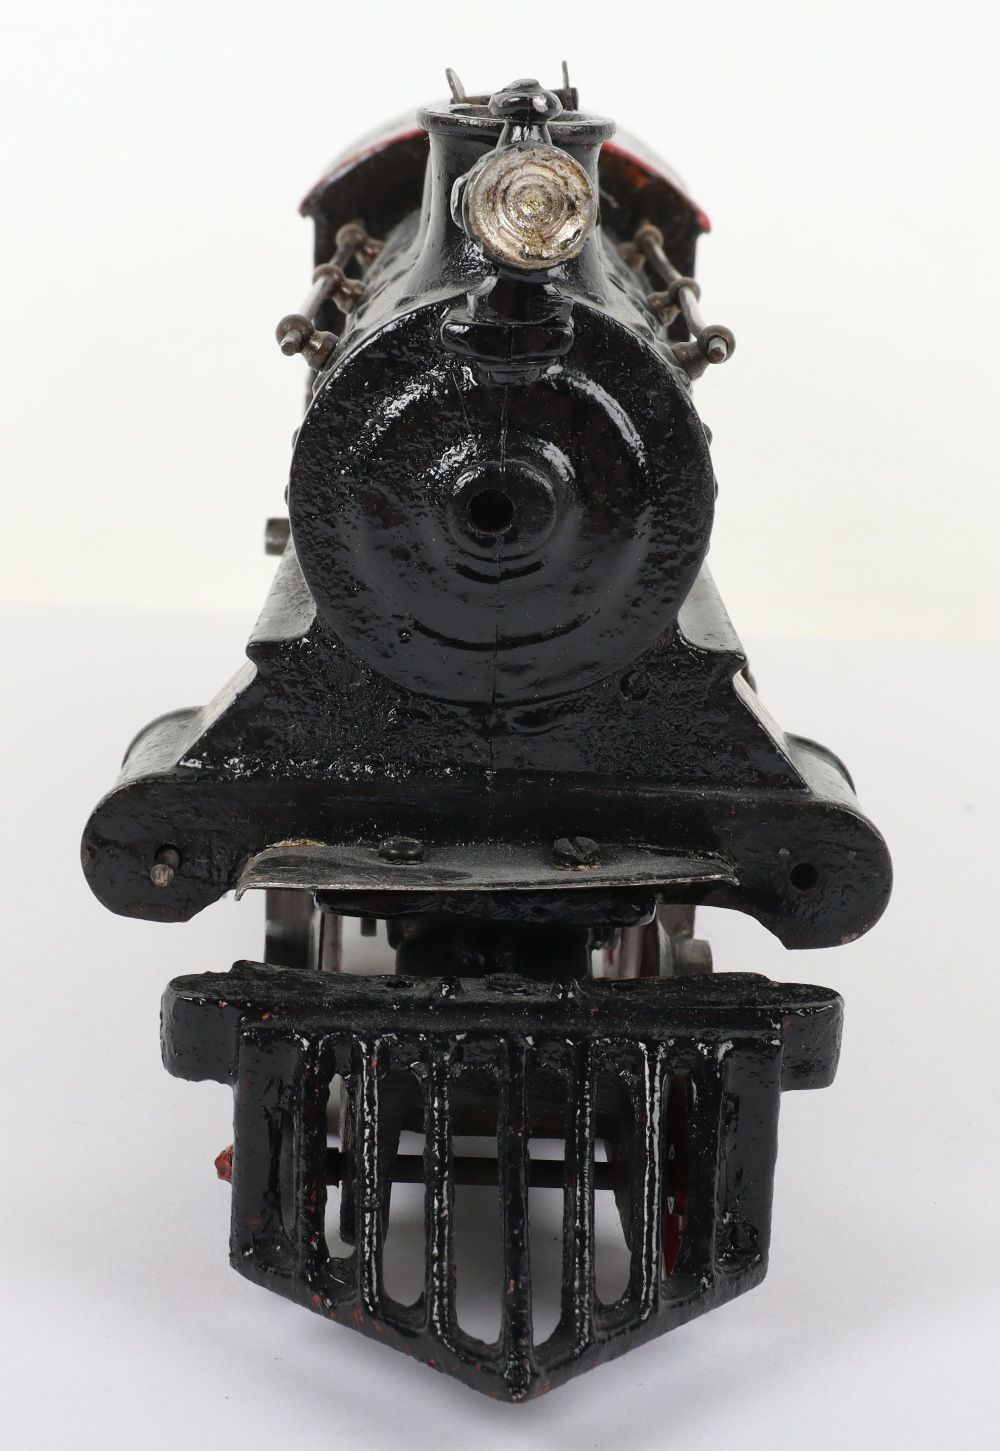 Bing gauge I cast iron 4-4-0 U.S outline clockwork locomotive, German circa 1910 - Image 4 of 5